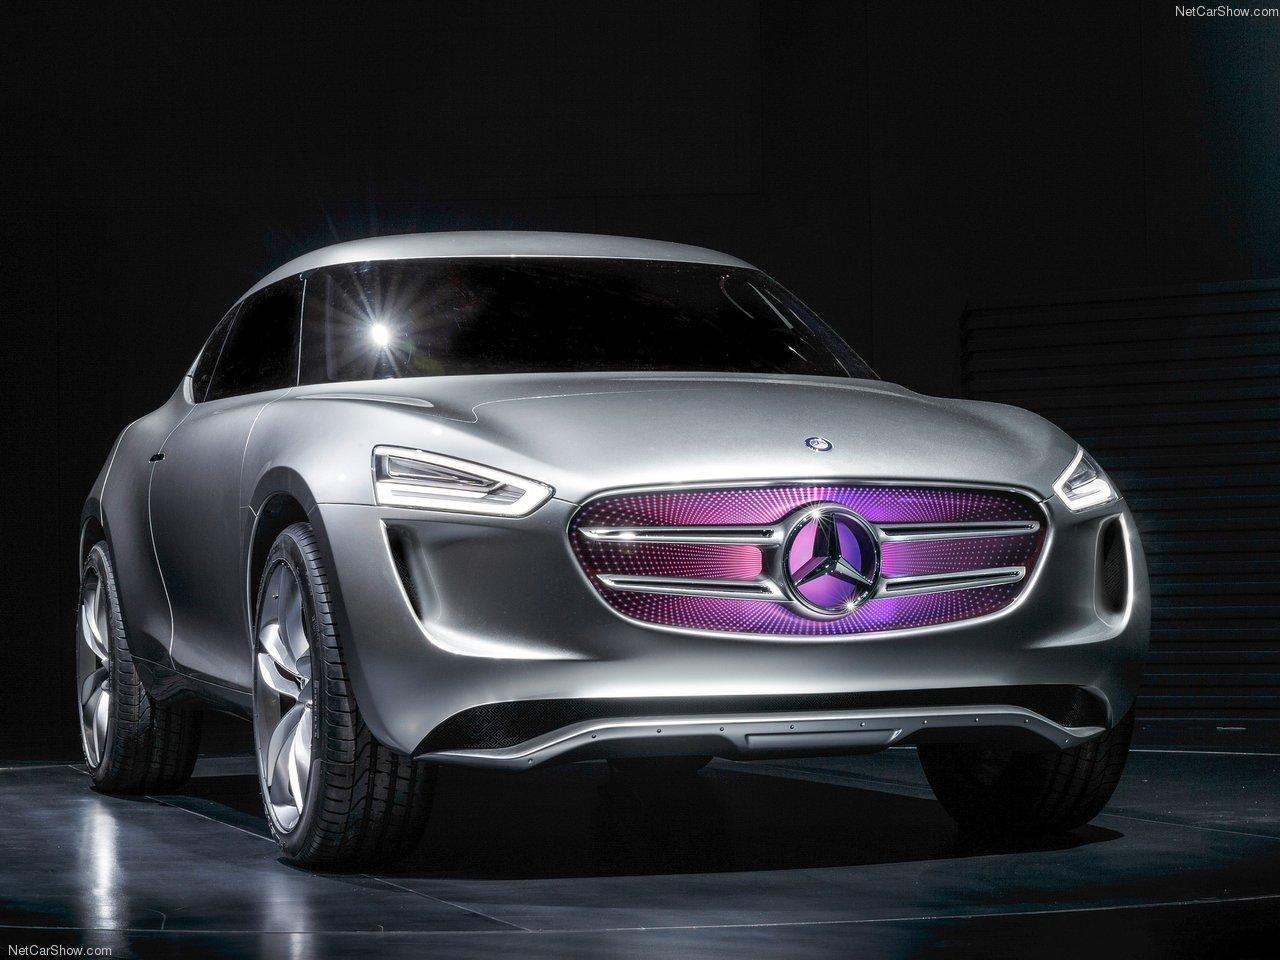 Mercedes benz long range ev preview confirmed for october for Mercedes benz long